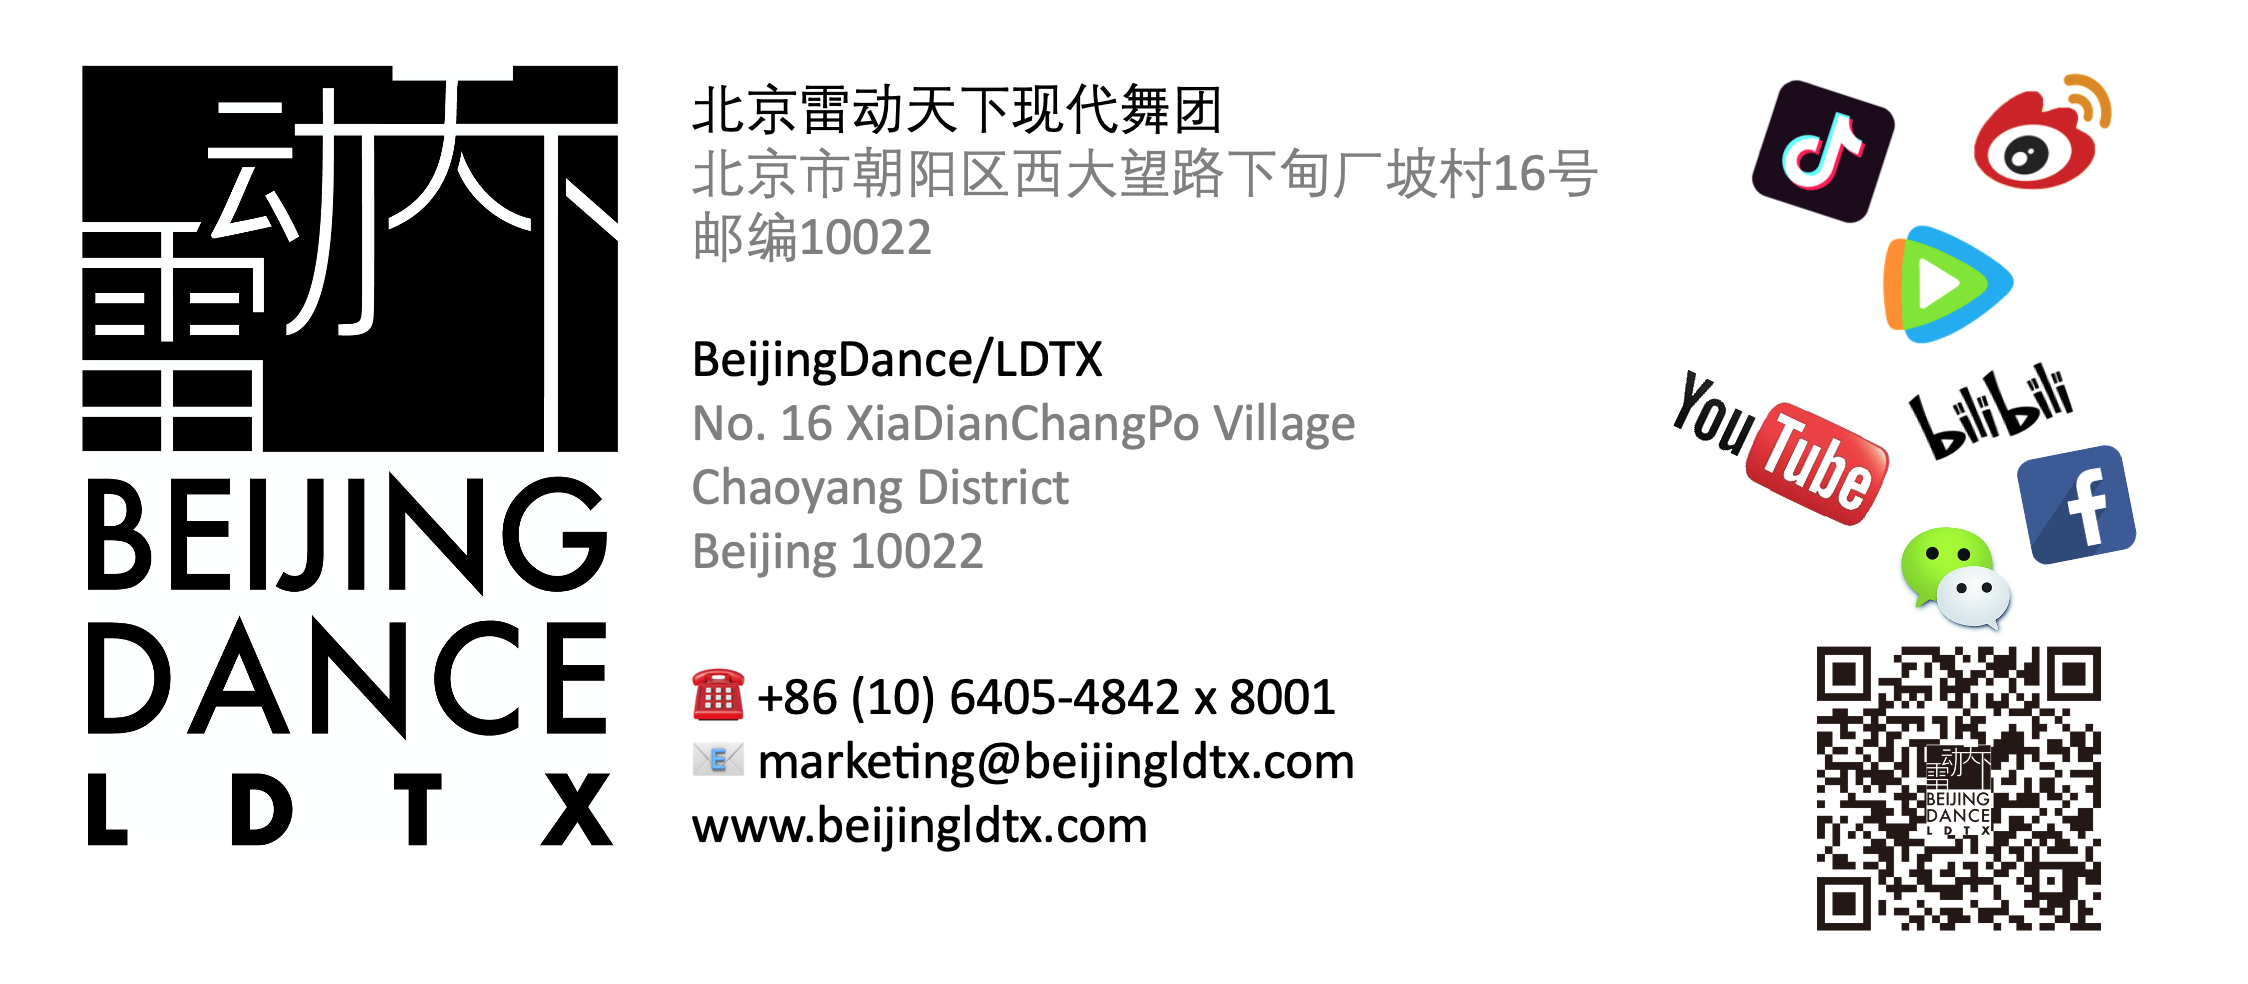 Boilerplate_LDTX-2_2021-05-21.png